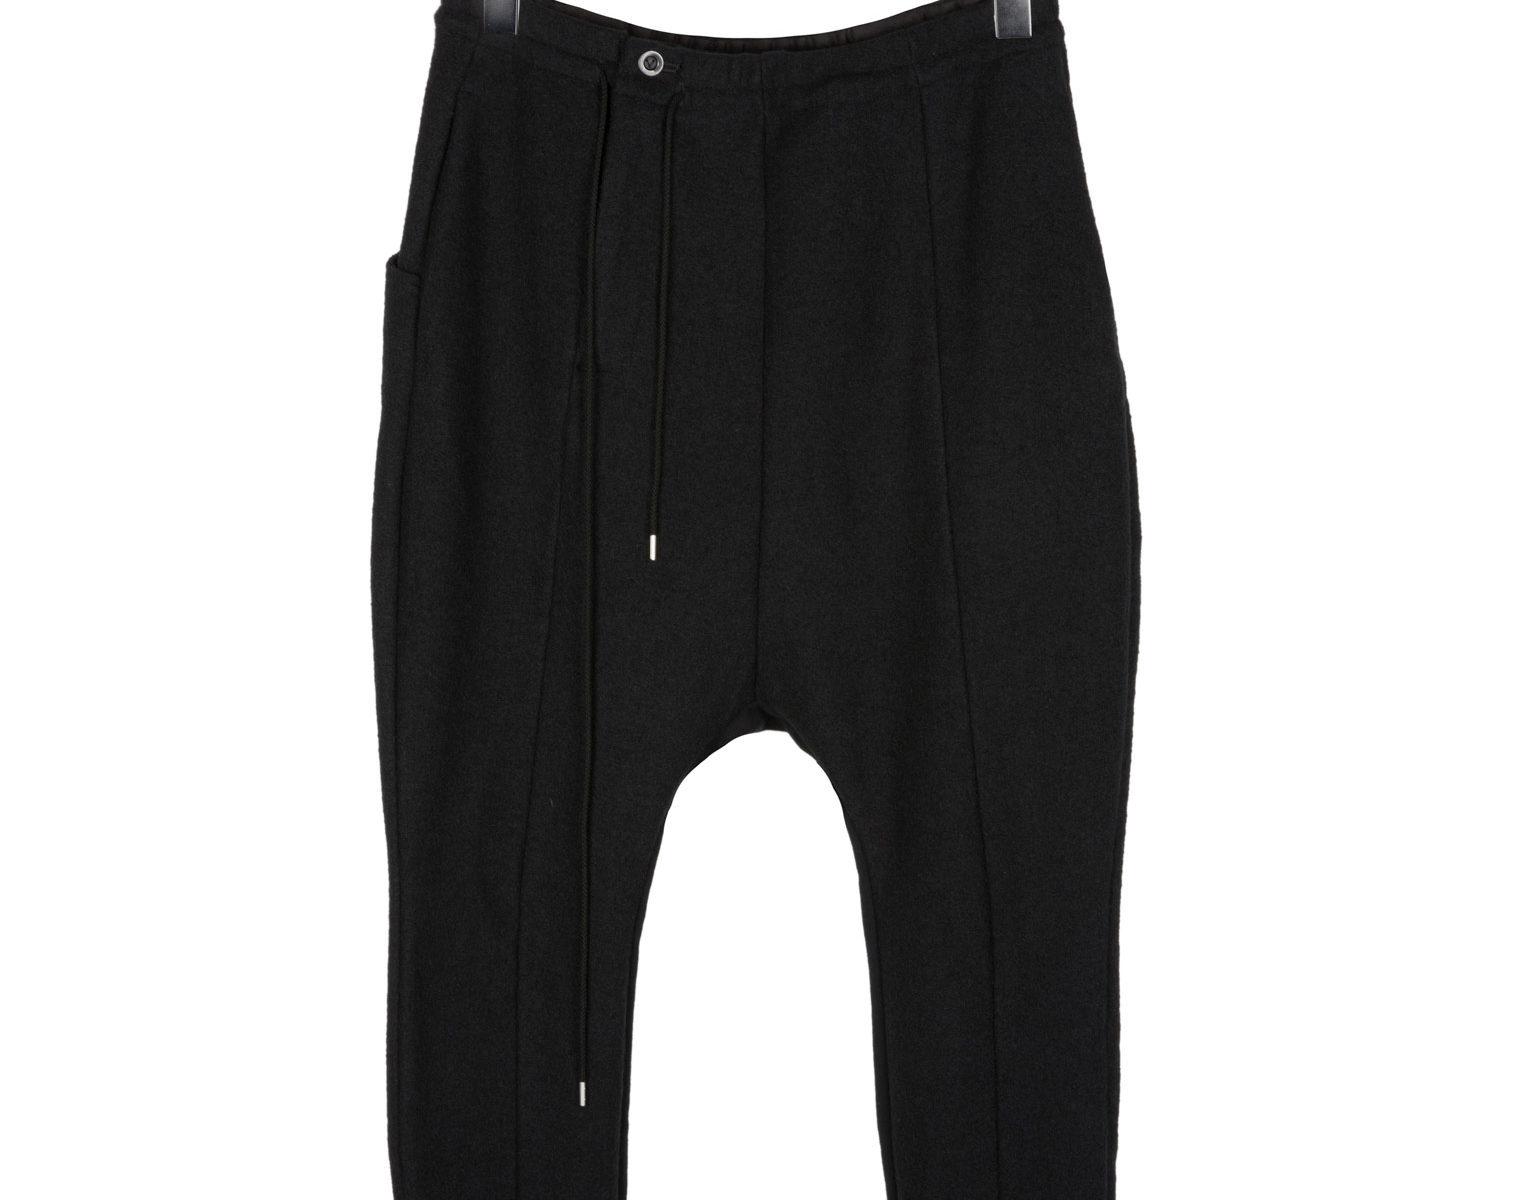 THE VIRIDI-ANNE Slim Pant 1